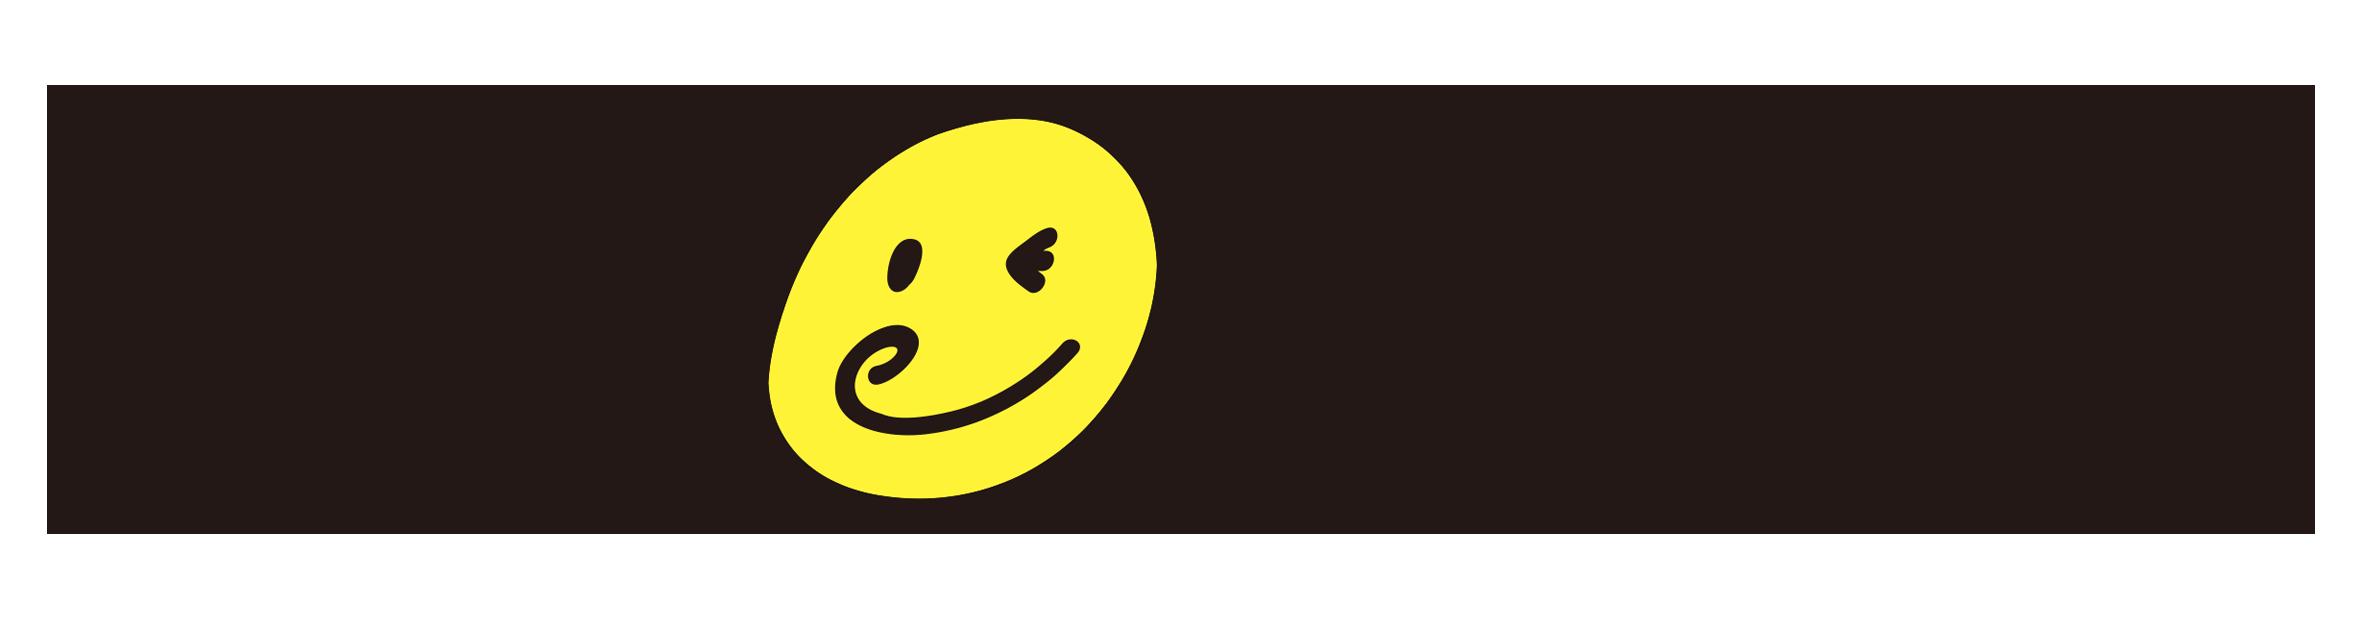 SmileBreadについて_ロゴ②.png